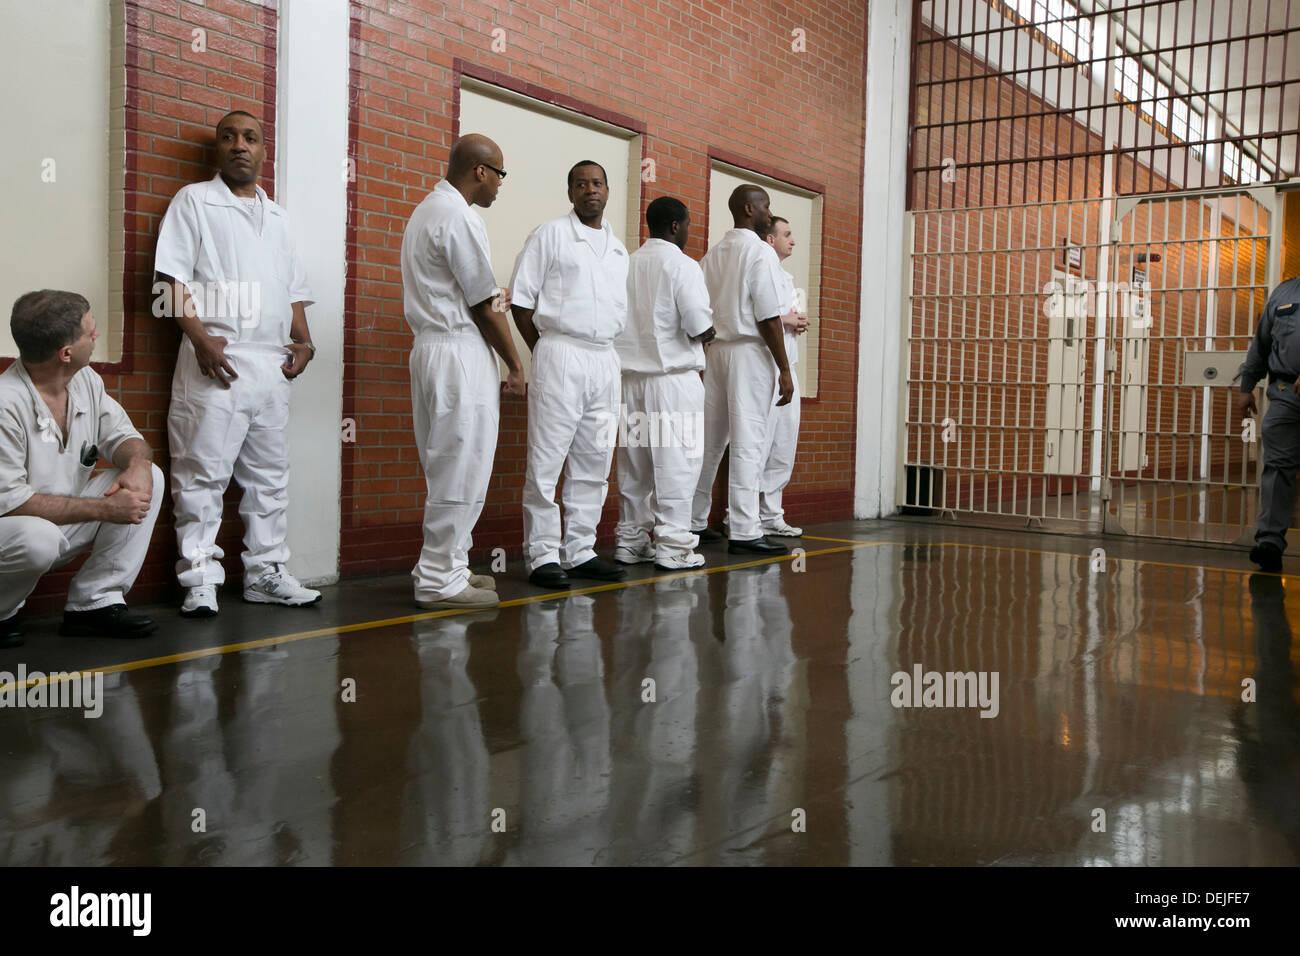 Male inmates at the Darrington Unit near Houston, Texas line up